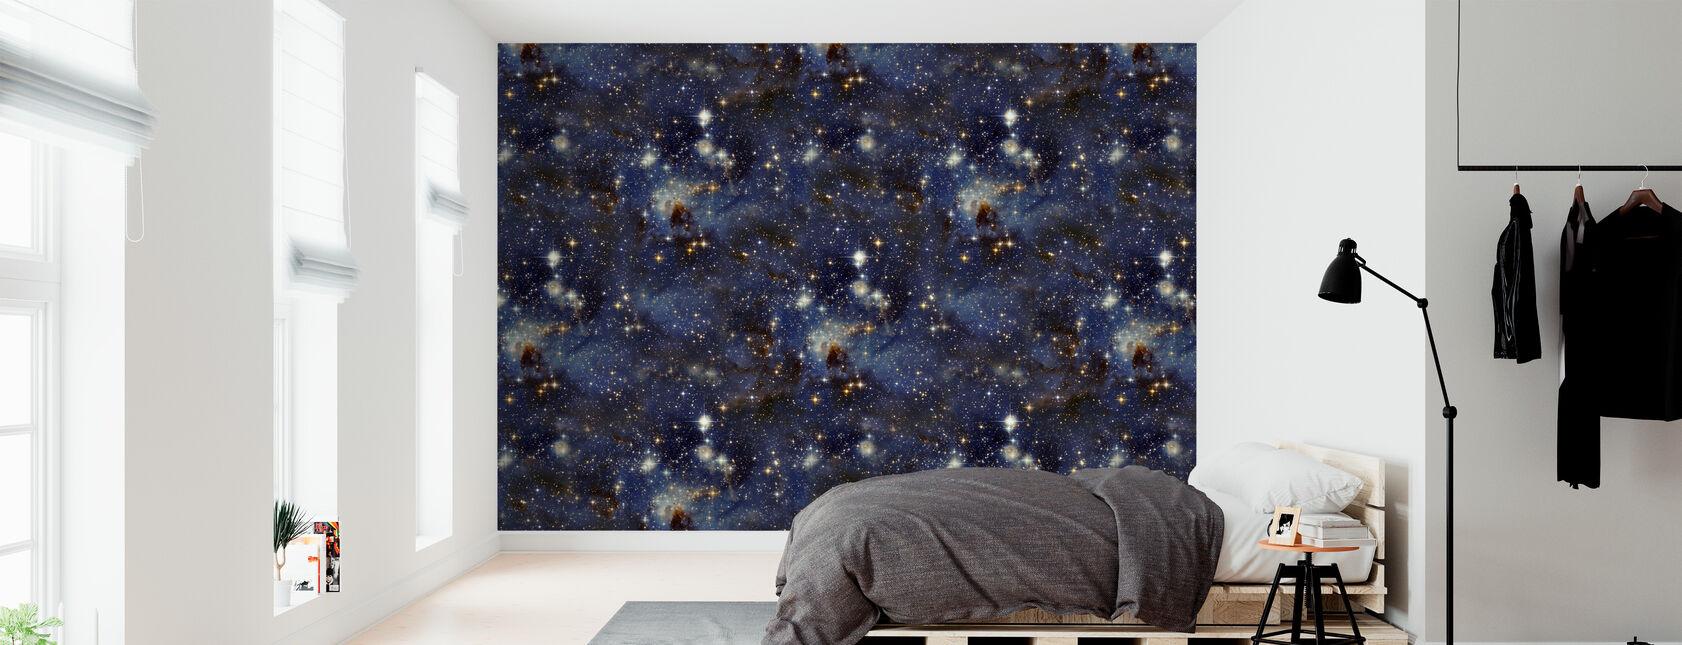 Blauwe Sky Rivier - Behang - Slaapkamer